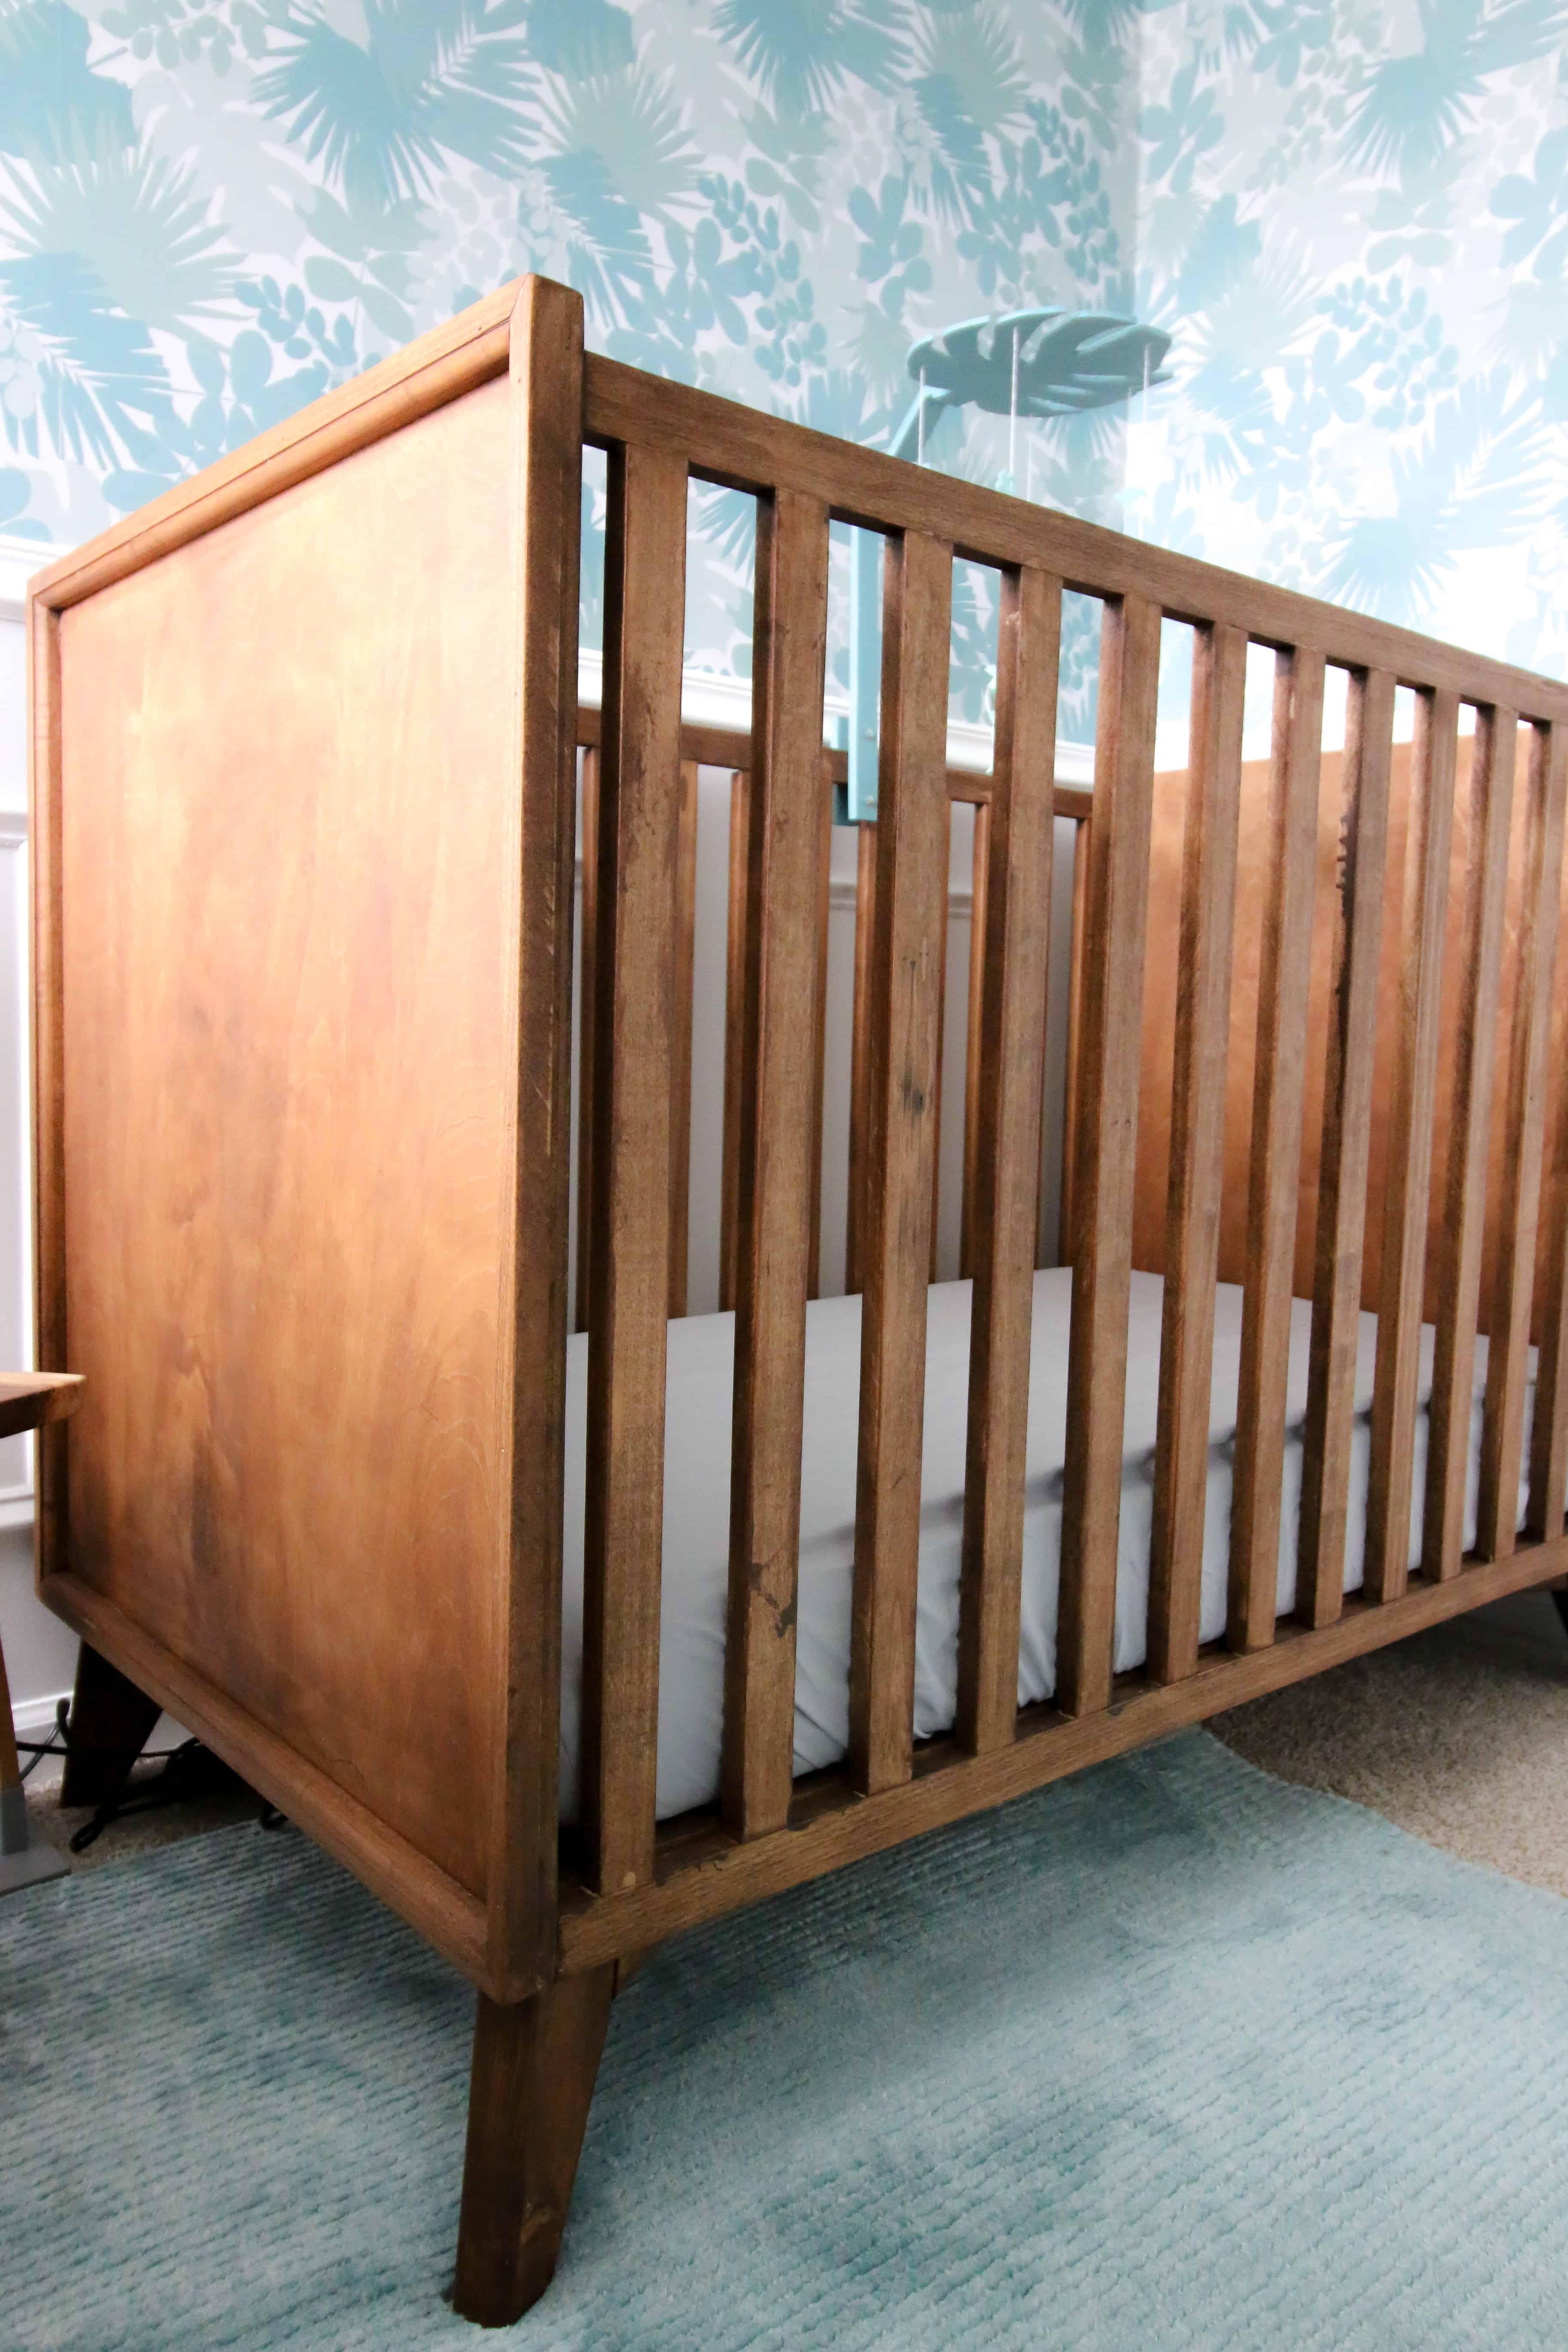 DIY mid century modern crib